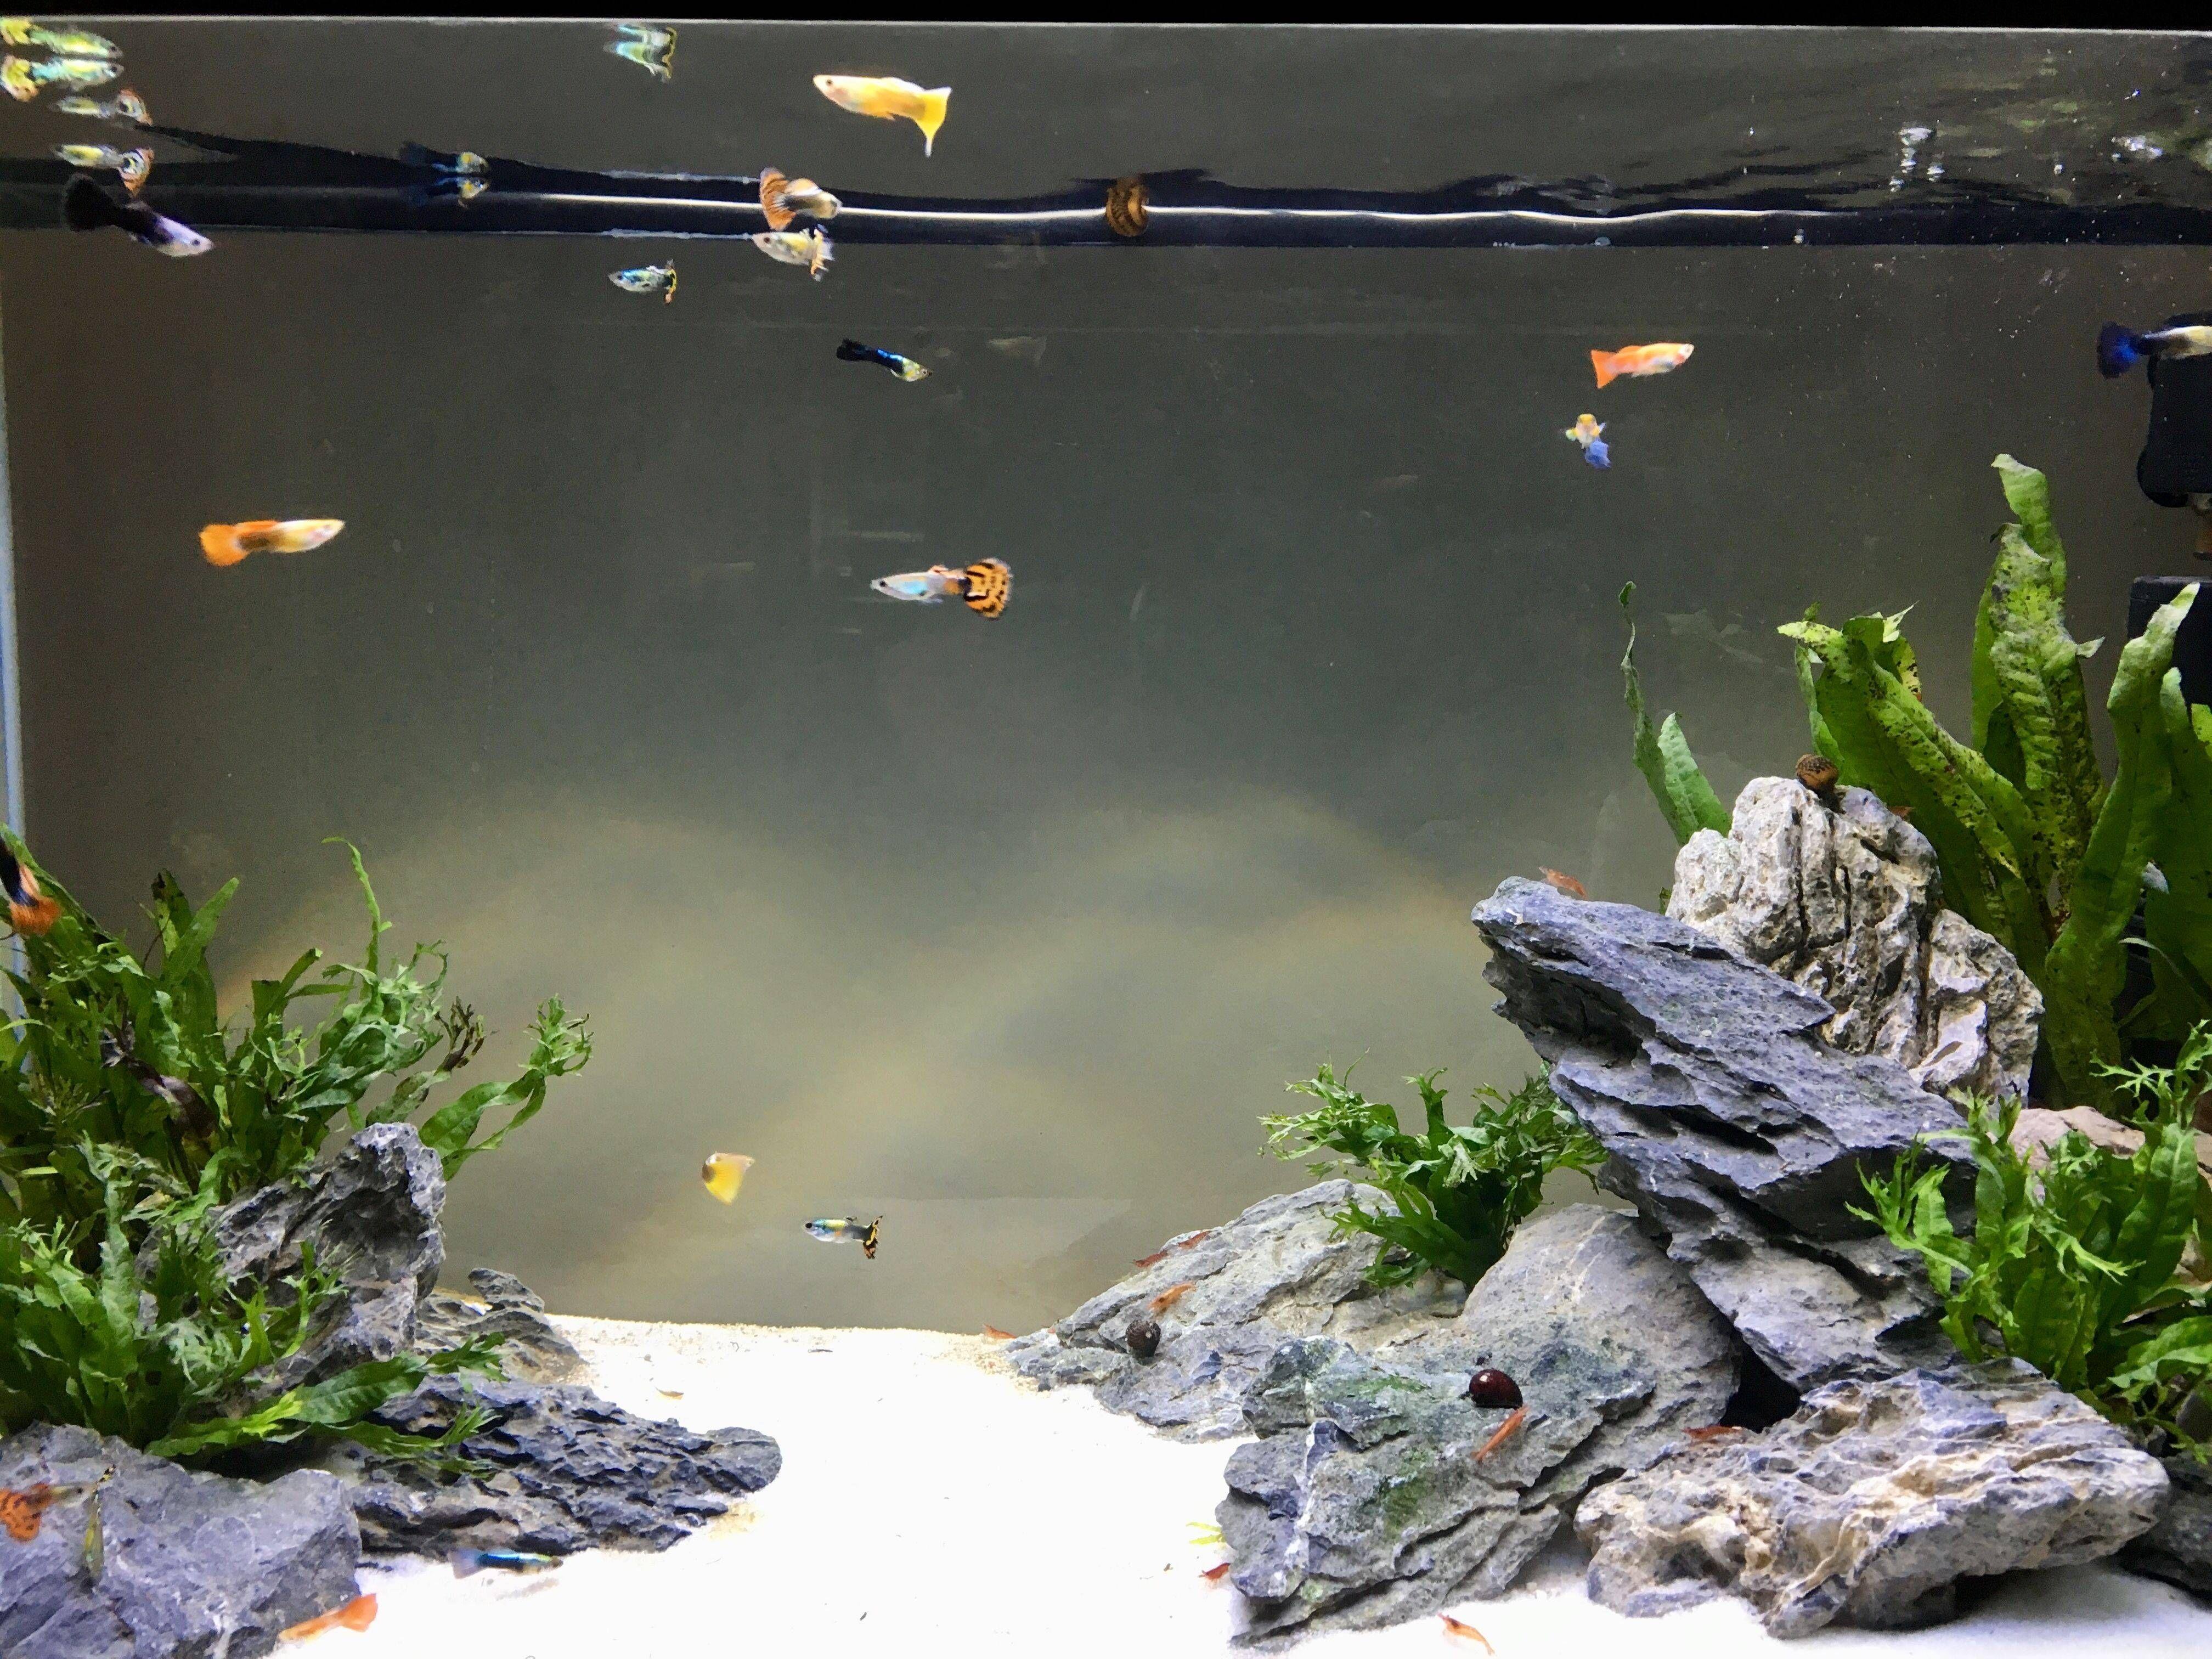 Contemporary Fish Tanks Buildingdesign Homedesign Architecture Home Design Housedesignidea Pr Fresh Water Fish Tank Small Fish Tanks Fish Tank Design